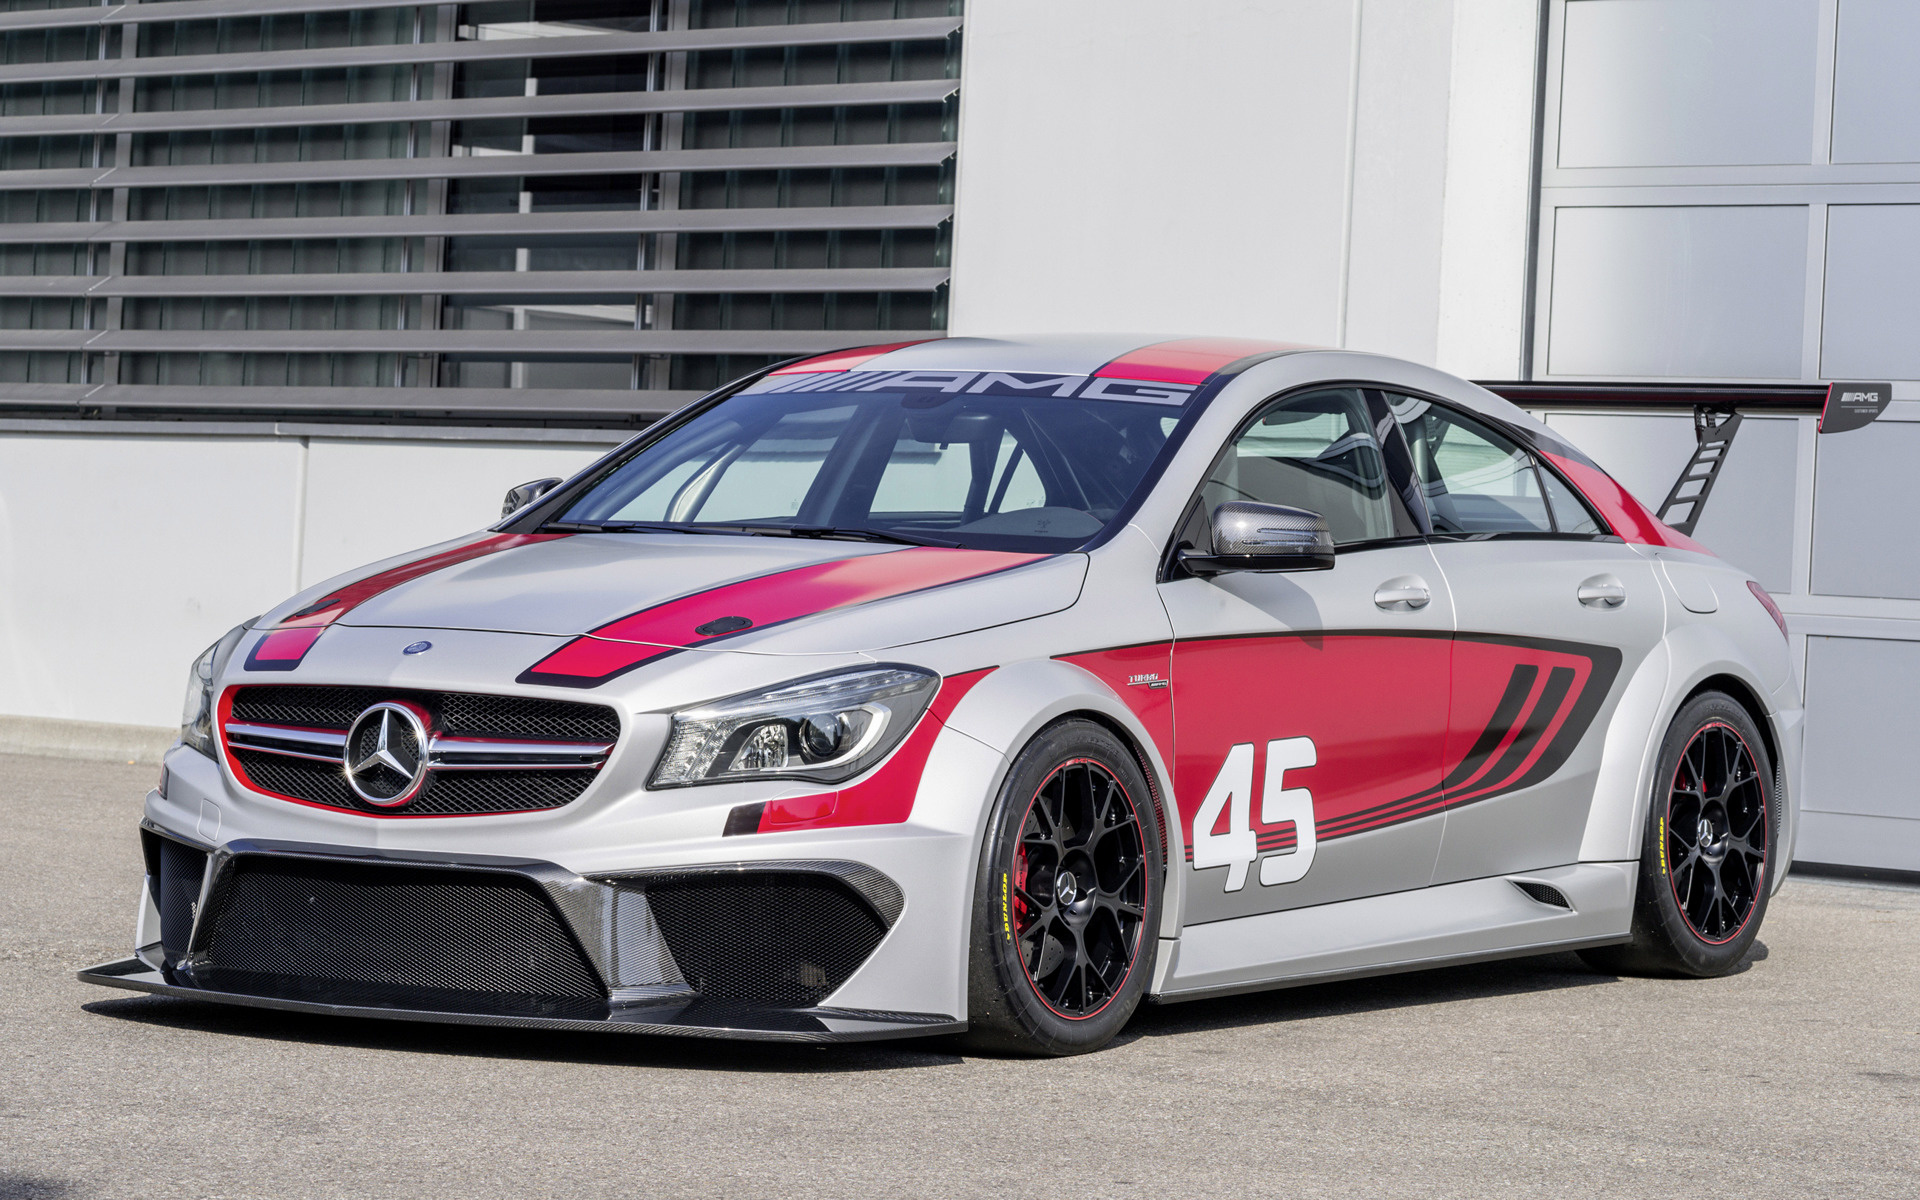 2013 Mercedes-Benz CLA 45 AMG Racing Series Concept ...